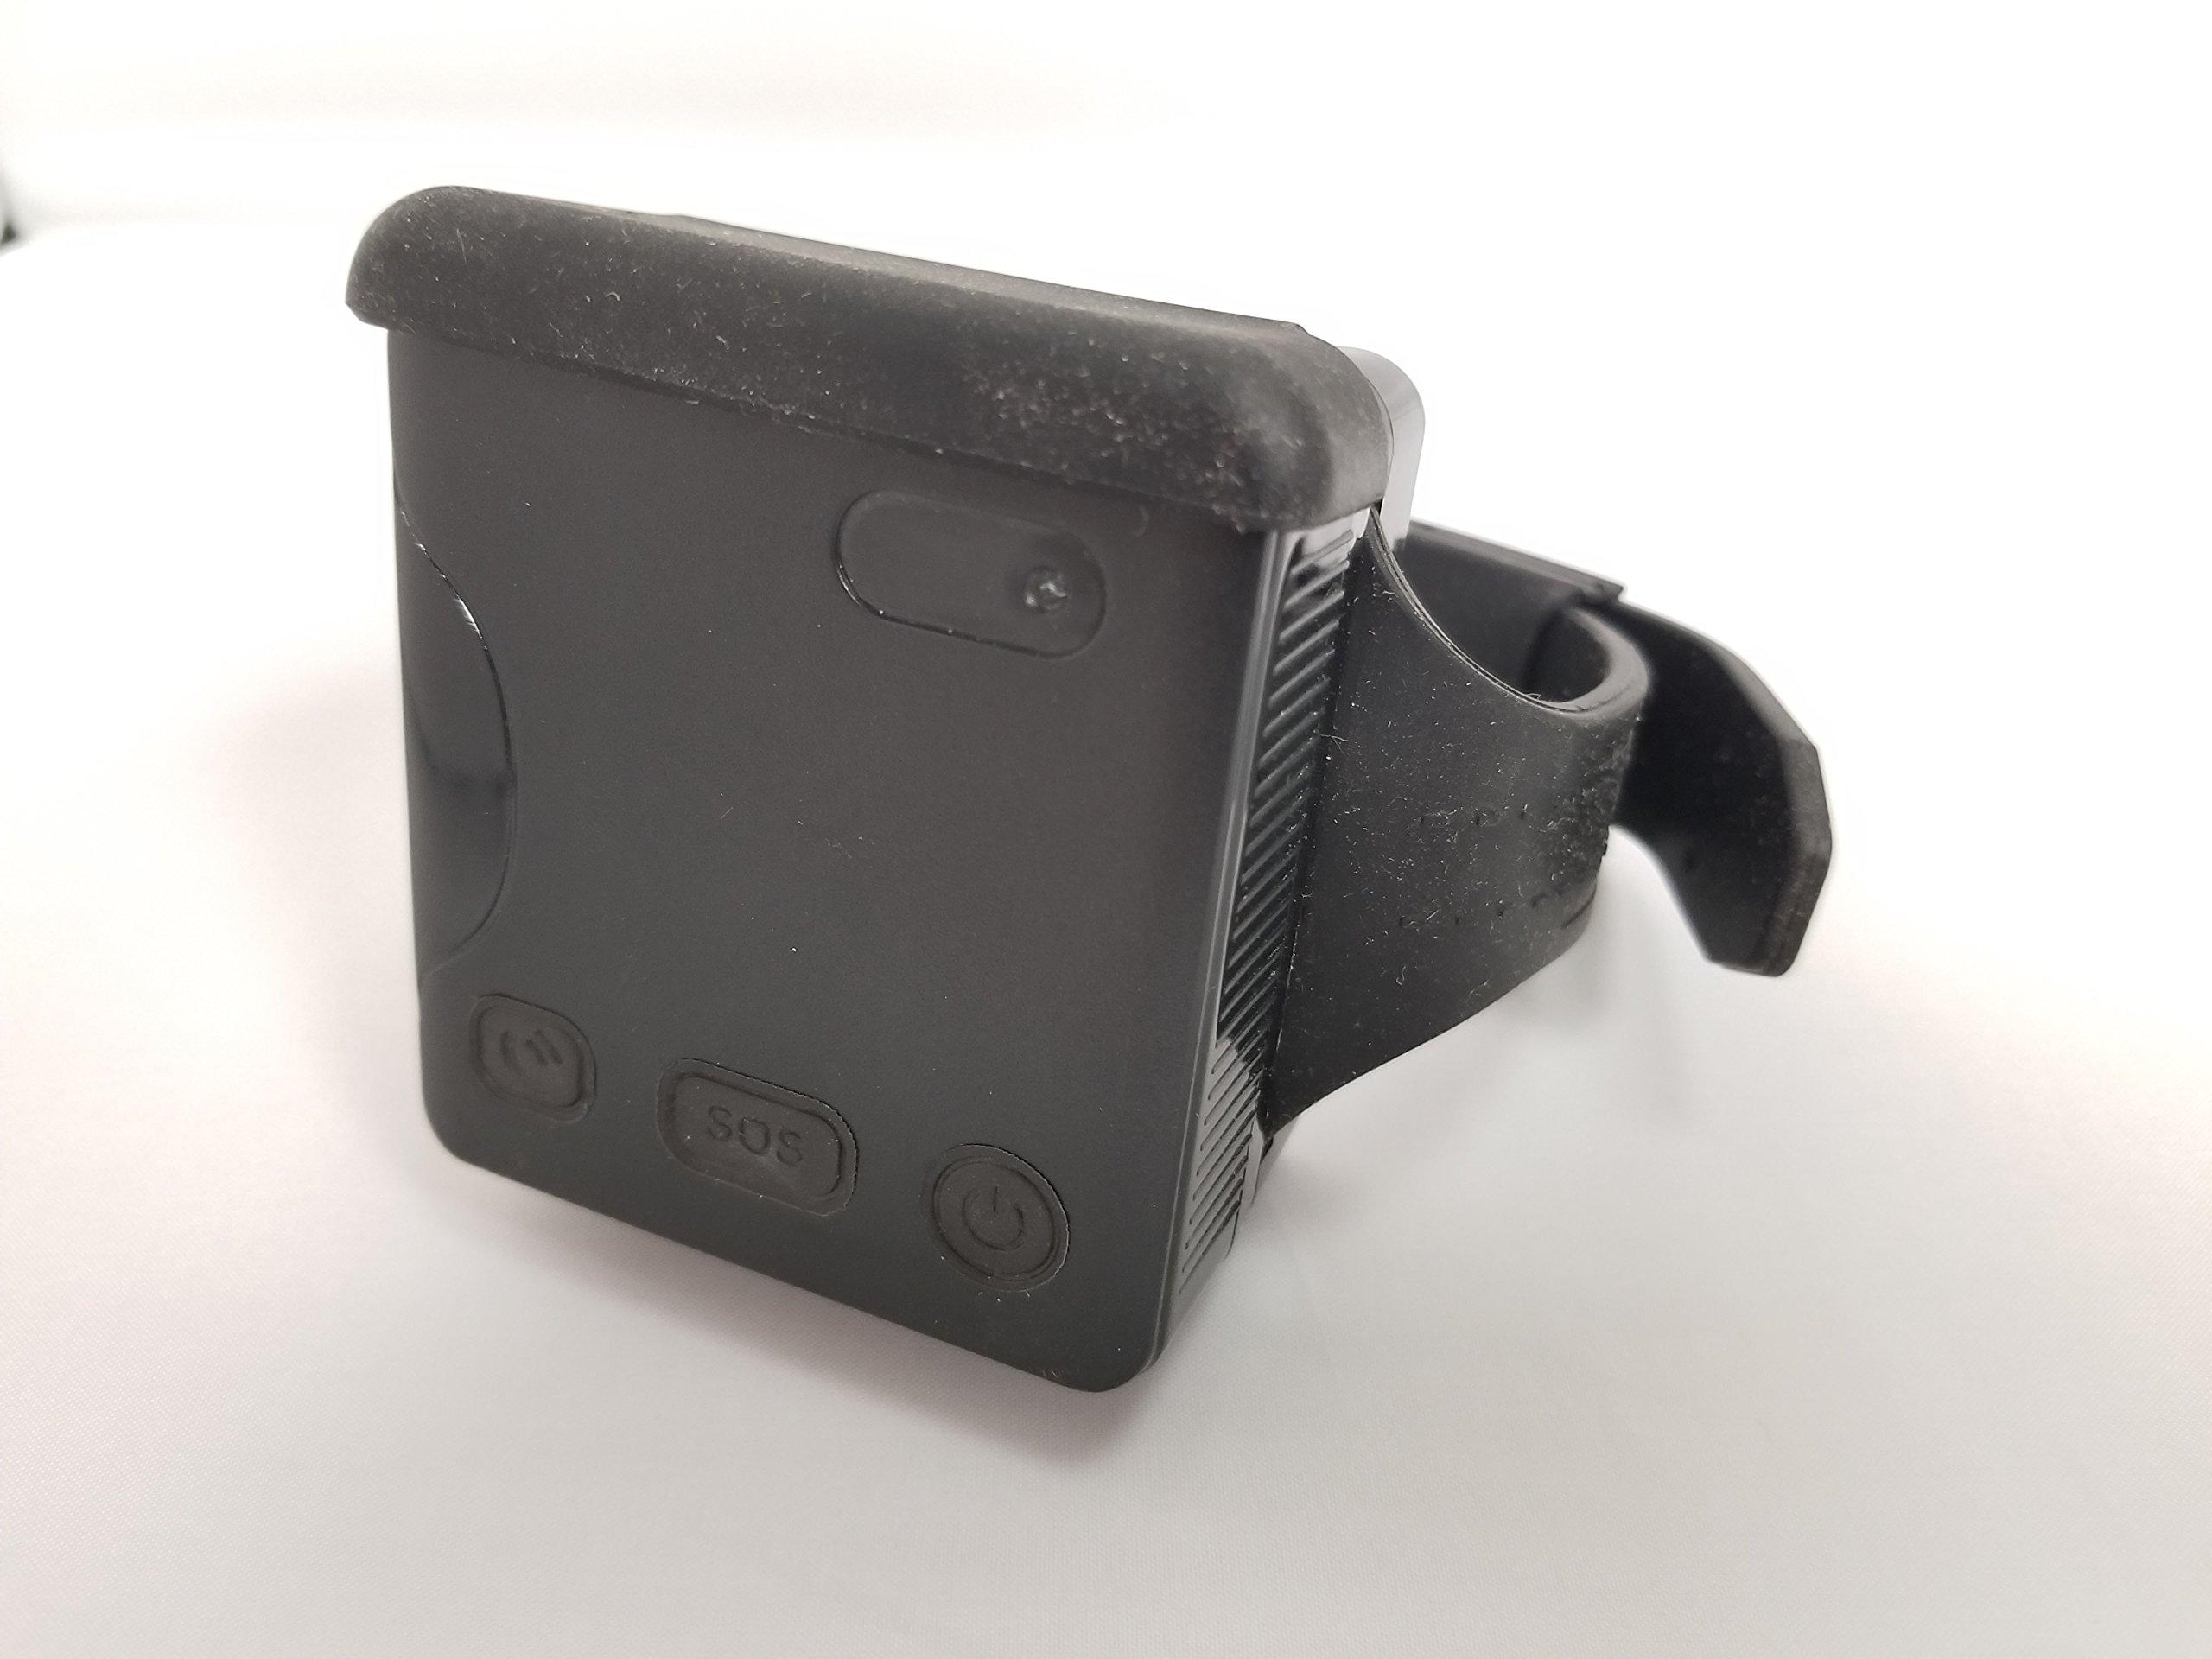 Megastek Ankle Tracker, GTM MT-200X Real Time 3G GPS Ankle Tracker America, Li-Polymer 1800mAh Battery 3.7V, Waterproof IP67, 2GB Memory, Ublox-7Q, Telit–SL869 GPS Chipset, CE Certified